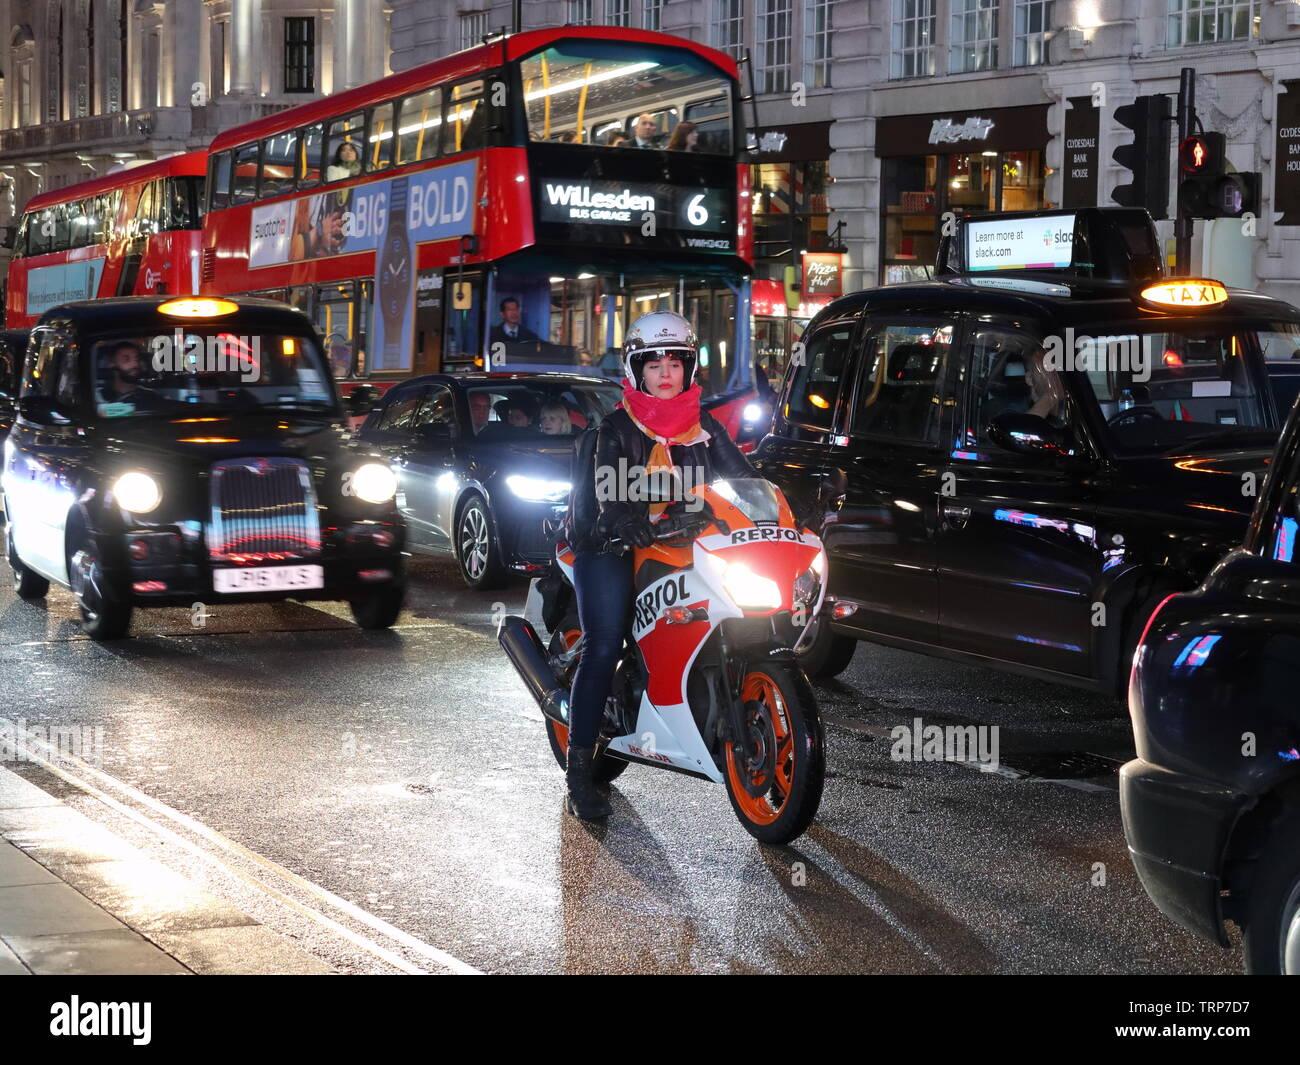 woman-biker-amonst-traffic-at-night-piccadilly-london-england-uk-TRP7D7.jpg